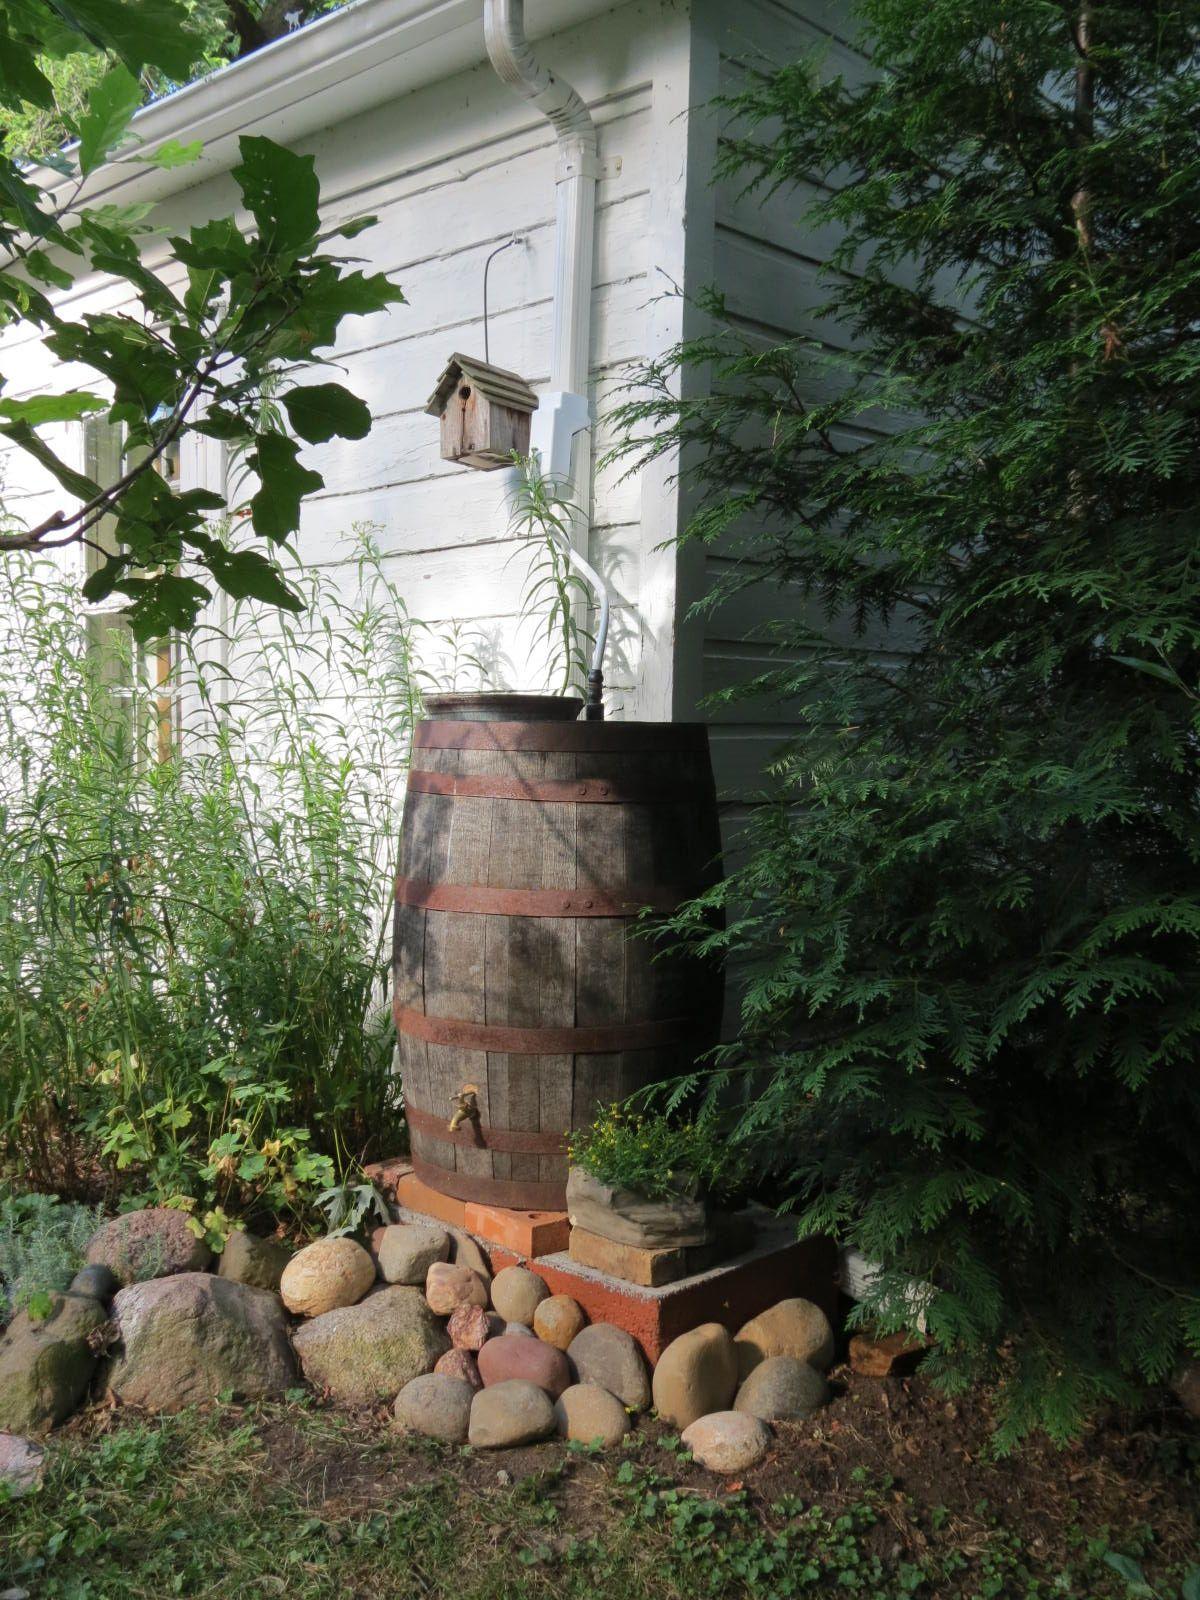 I like the stones built up around the rain barrel